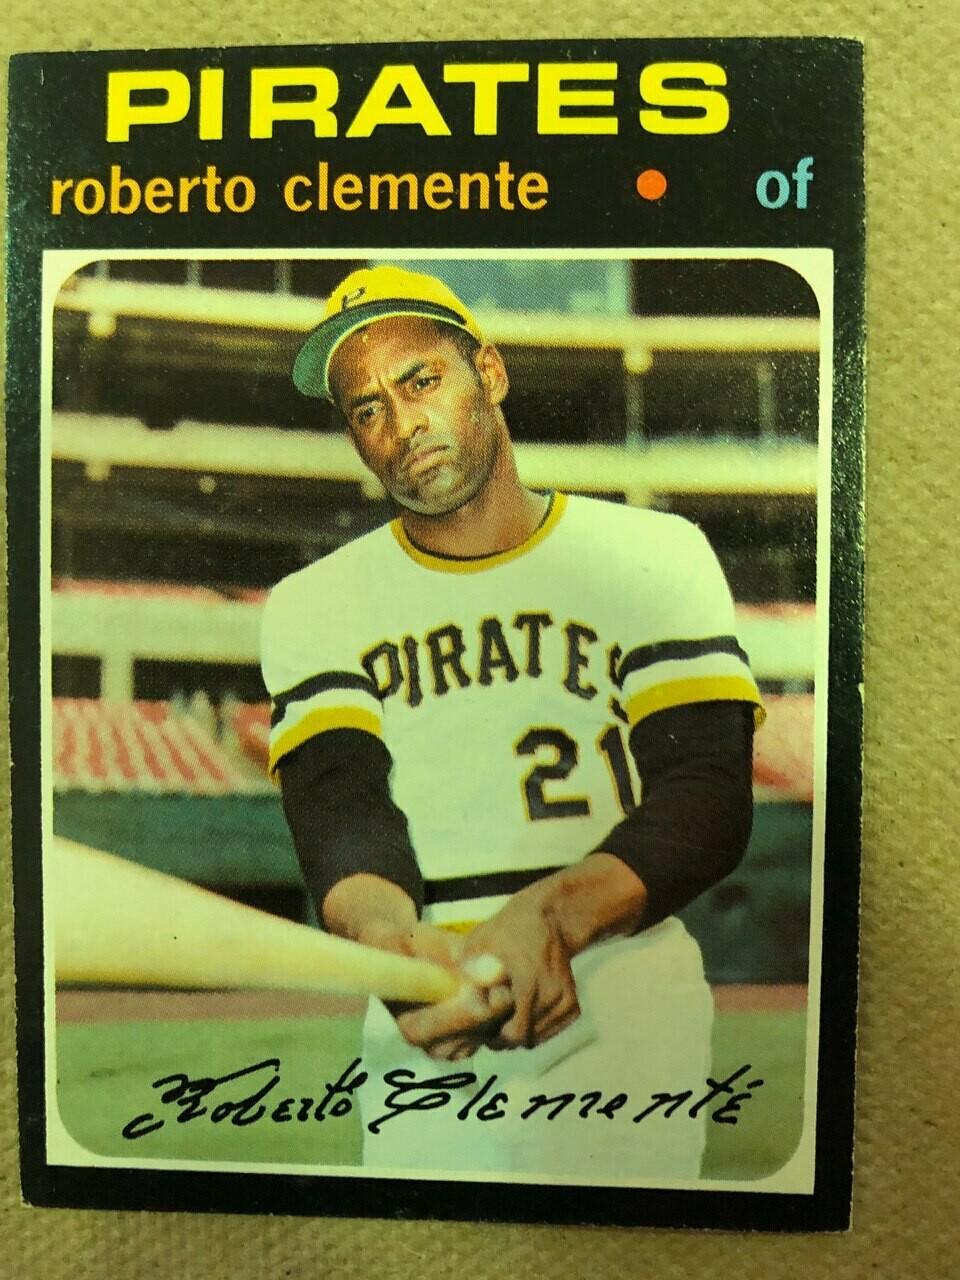 1971 Topps #630 Roberto Clemente, List $200, Sell $150